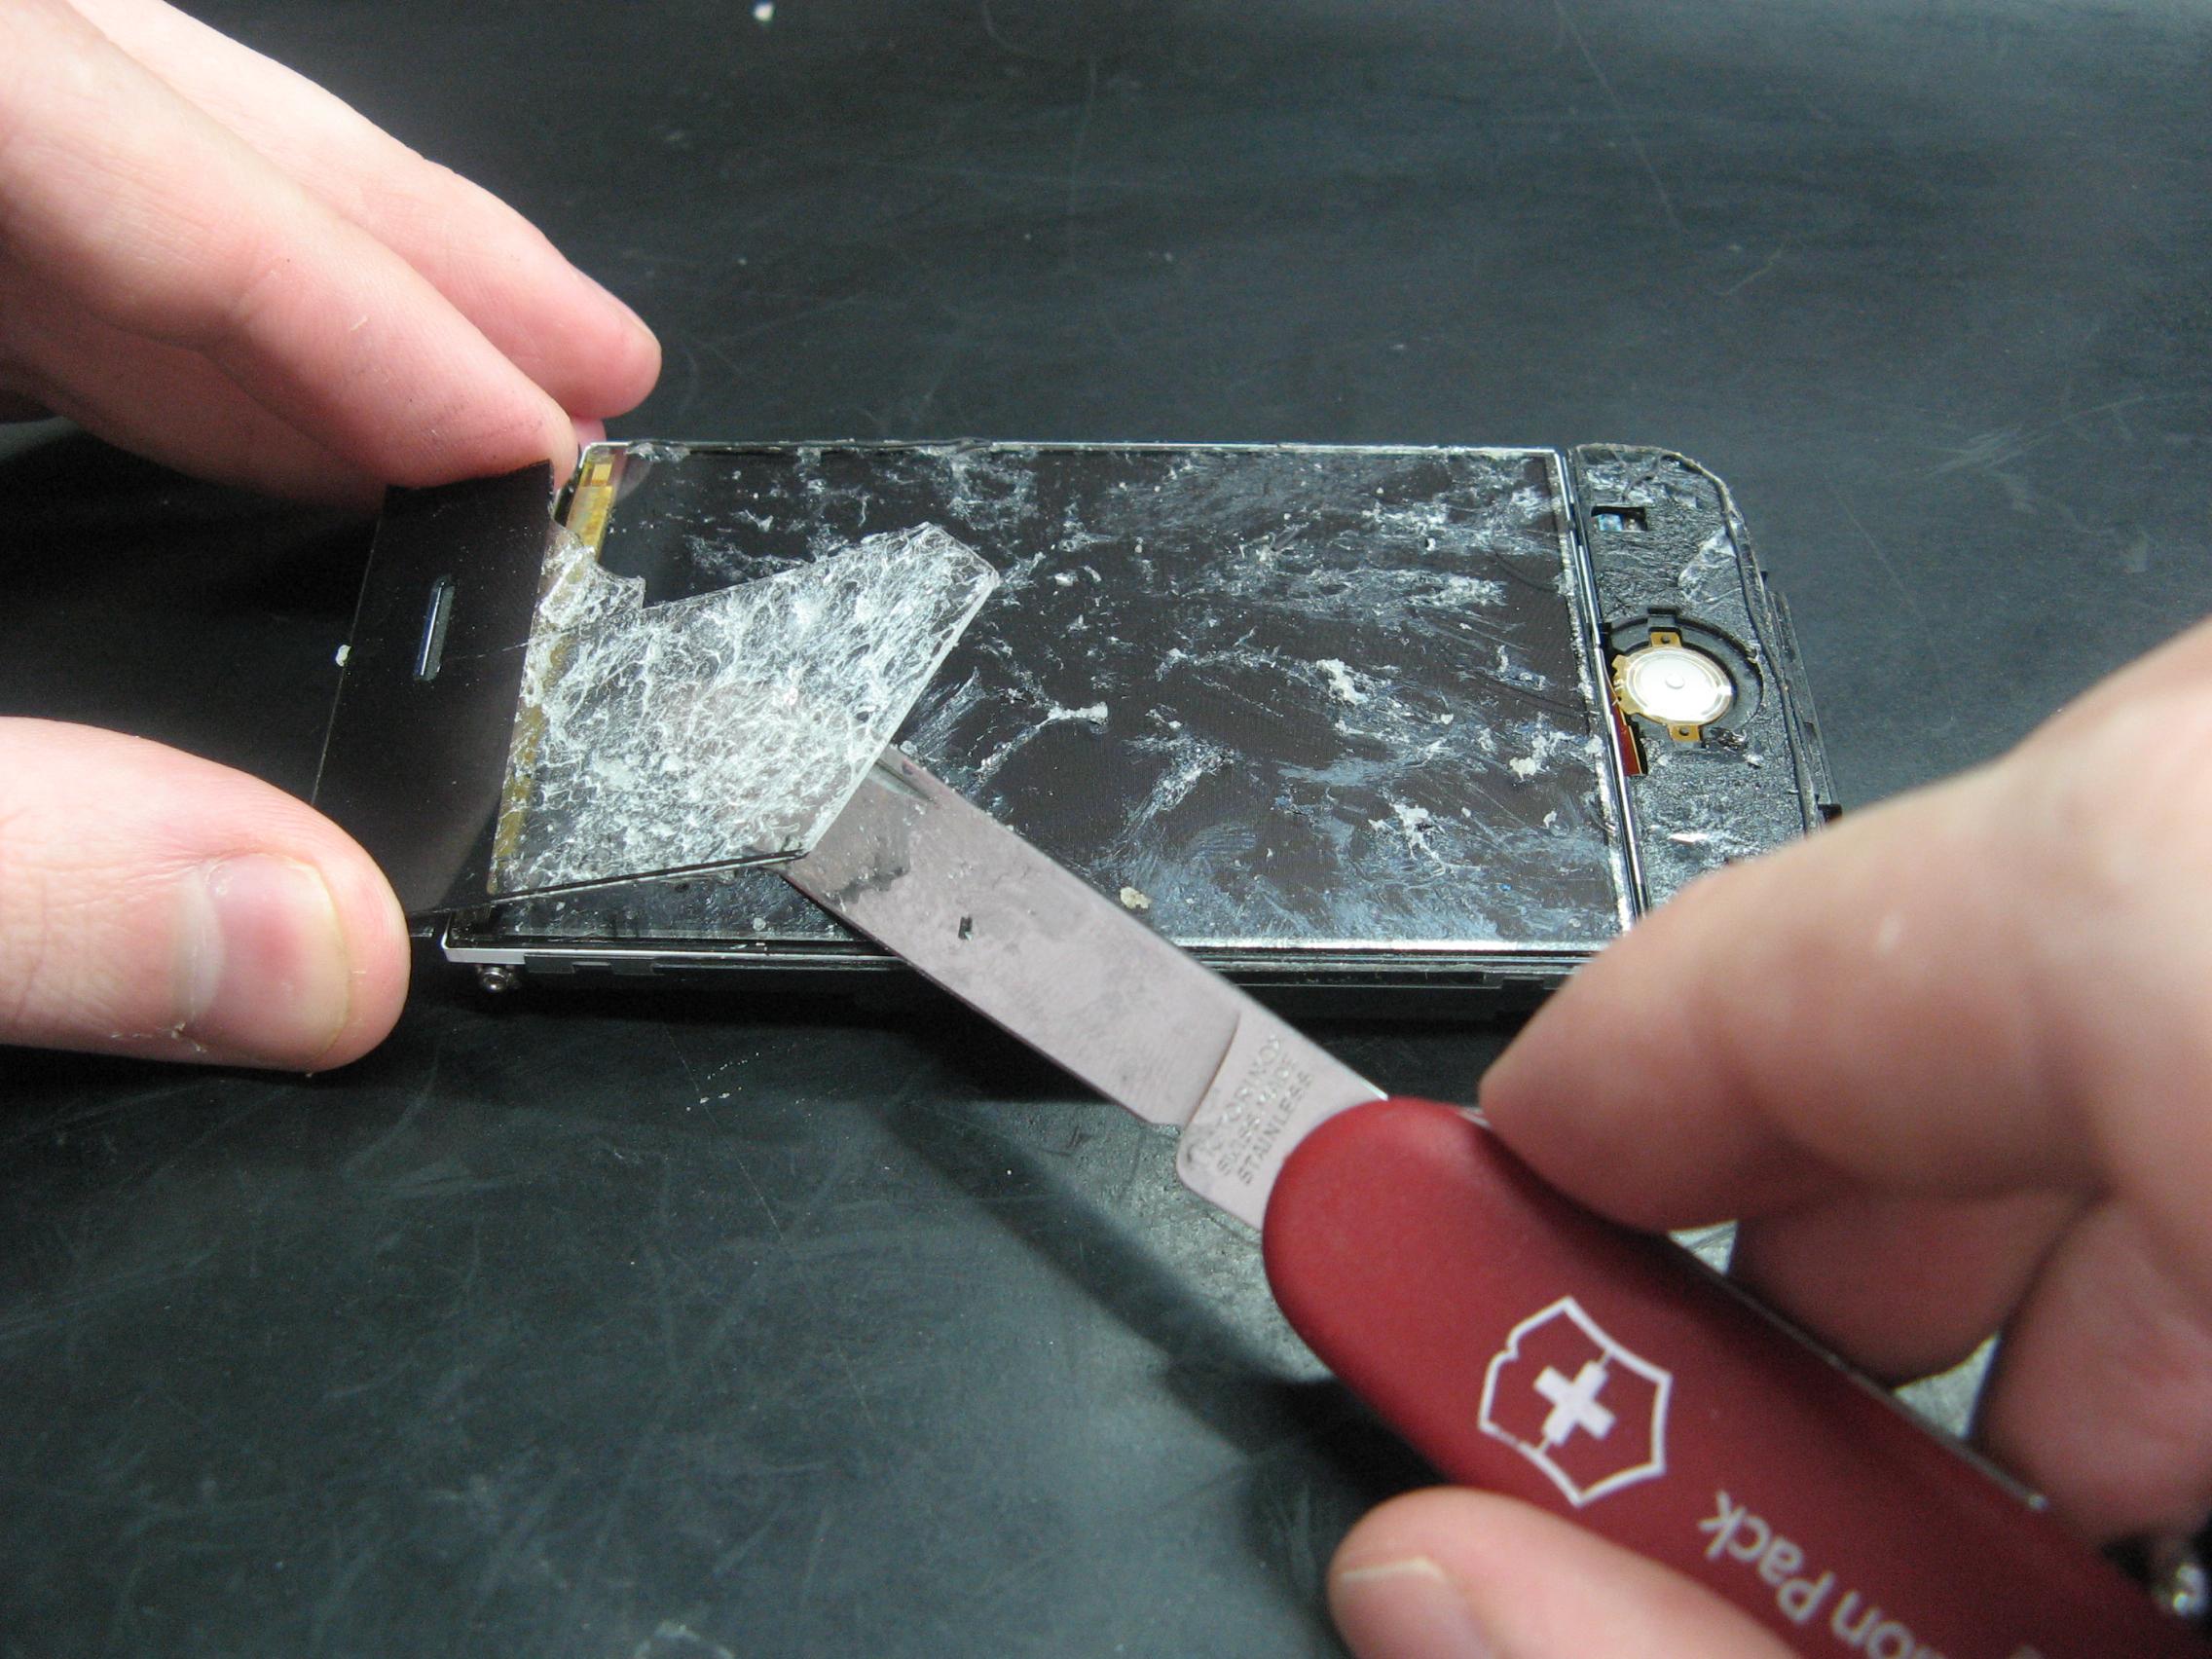 Замена экрана на телефоне своими руками